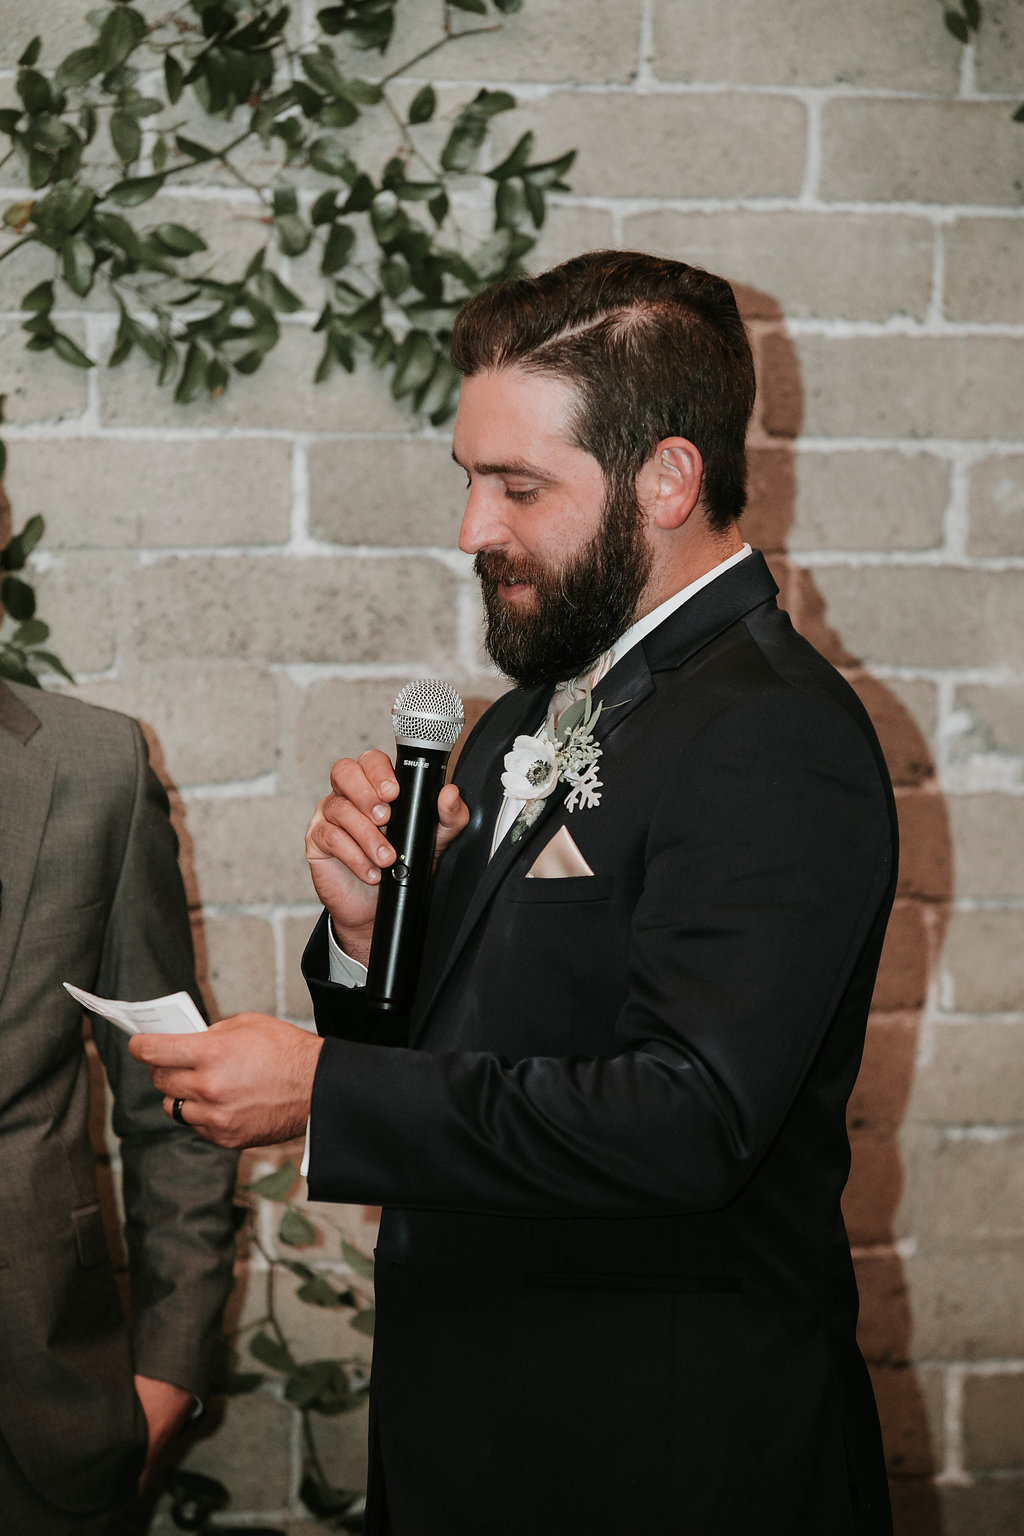 The_Big_Fake_wedding_Seattle_Within_sodo_wedding_by_Adina_Preston_Weddings_424.JPG